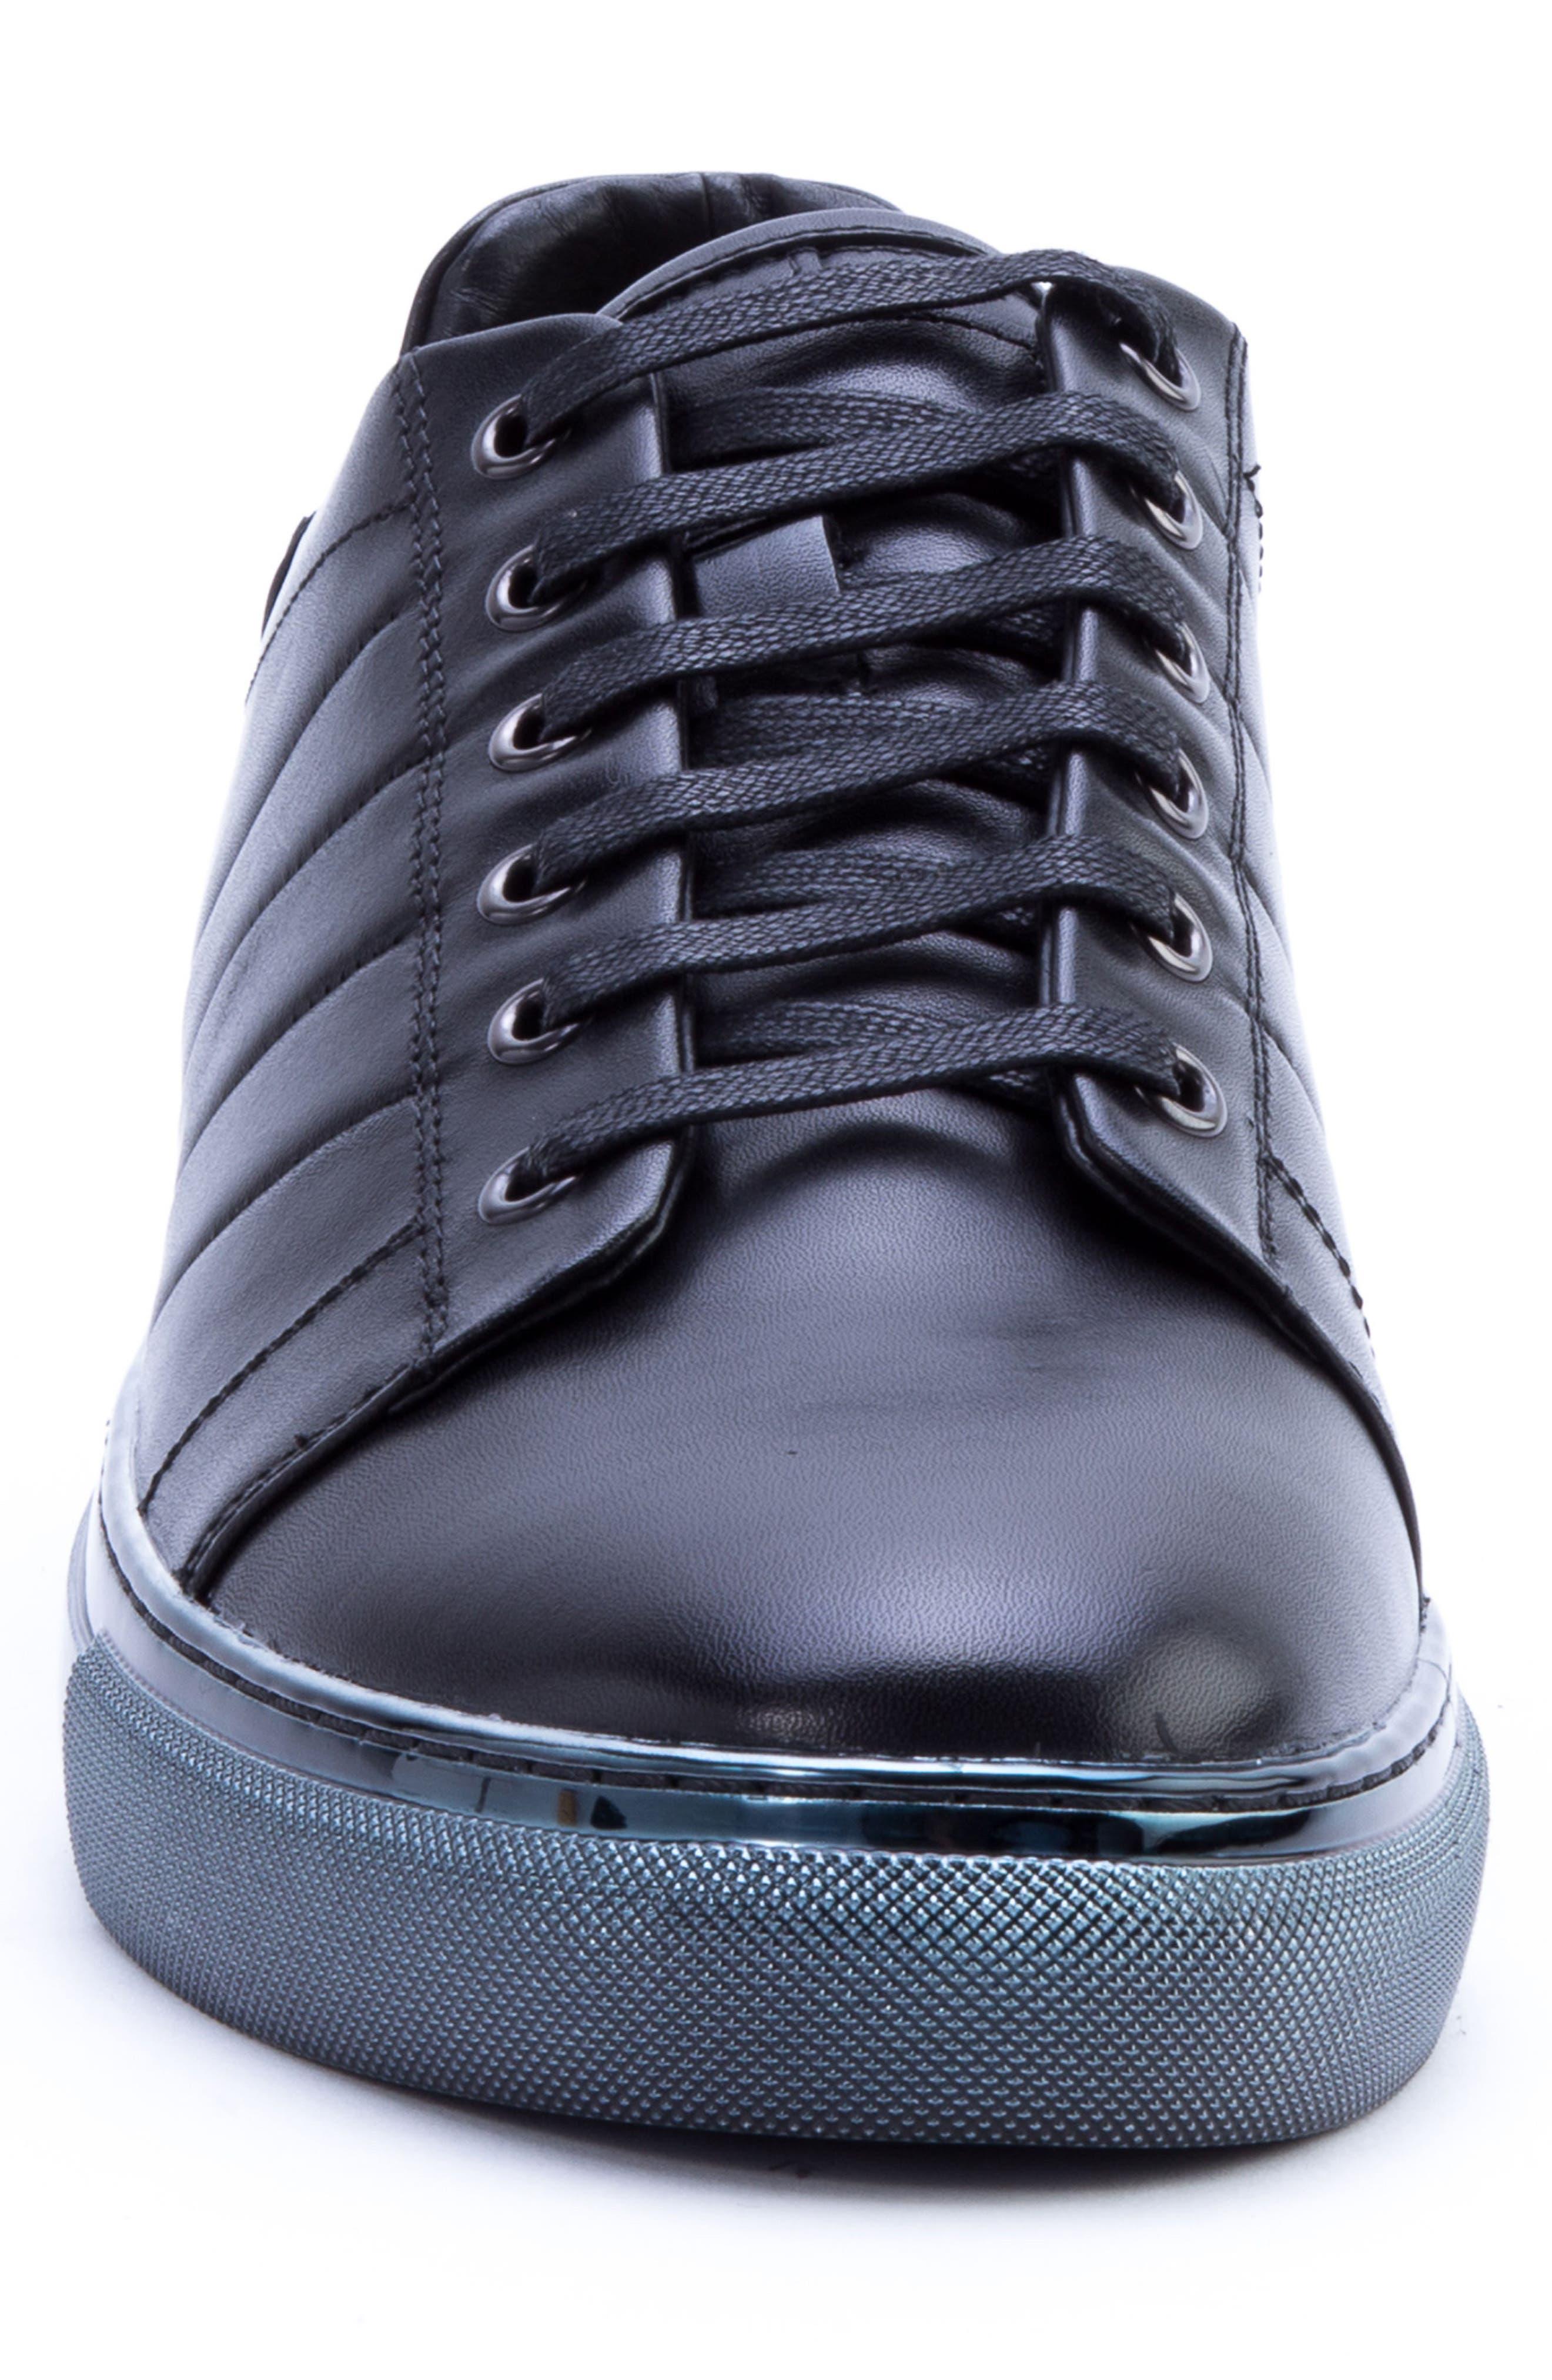 Badgley Mischka Brando Sneaker,                             Alternate thumbnail 4, color,                             BLACK LEATHER